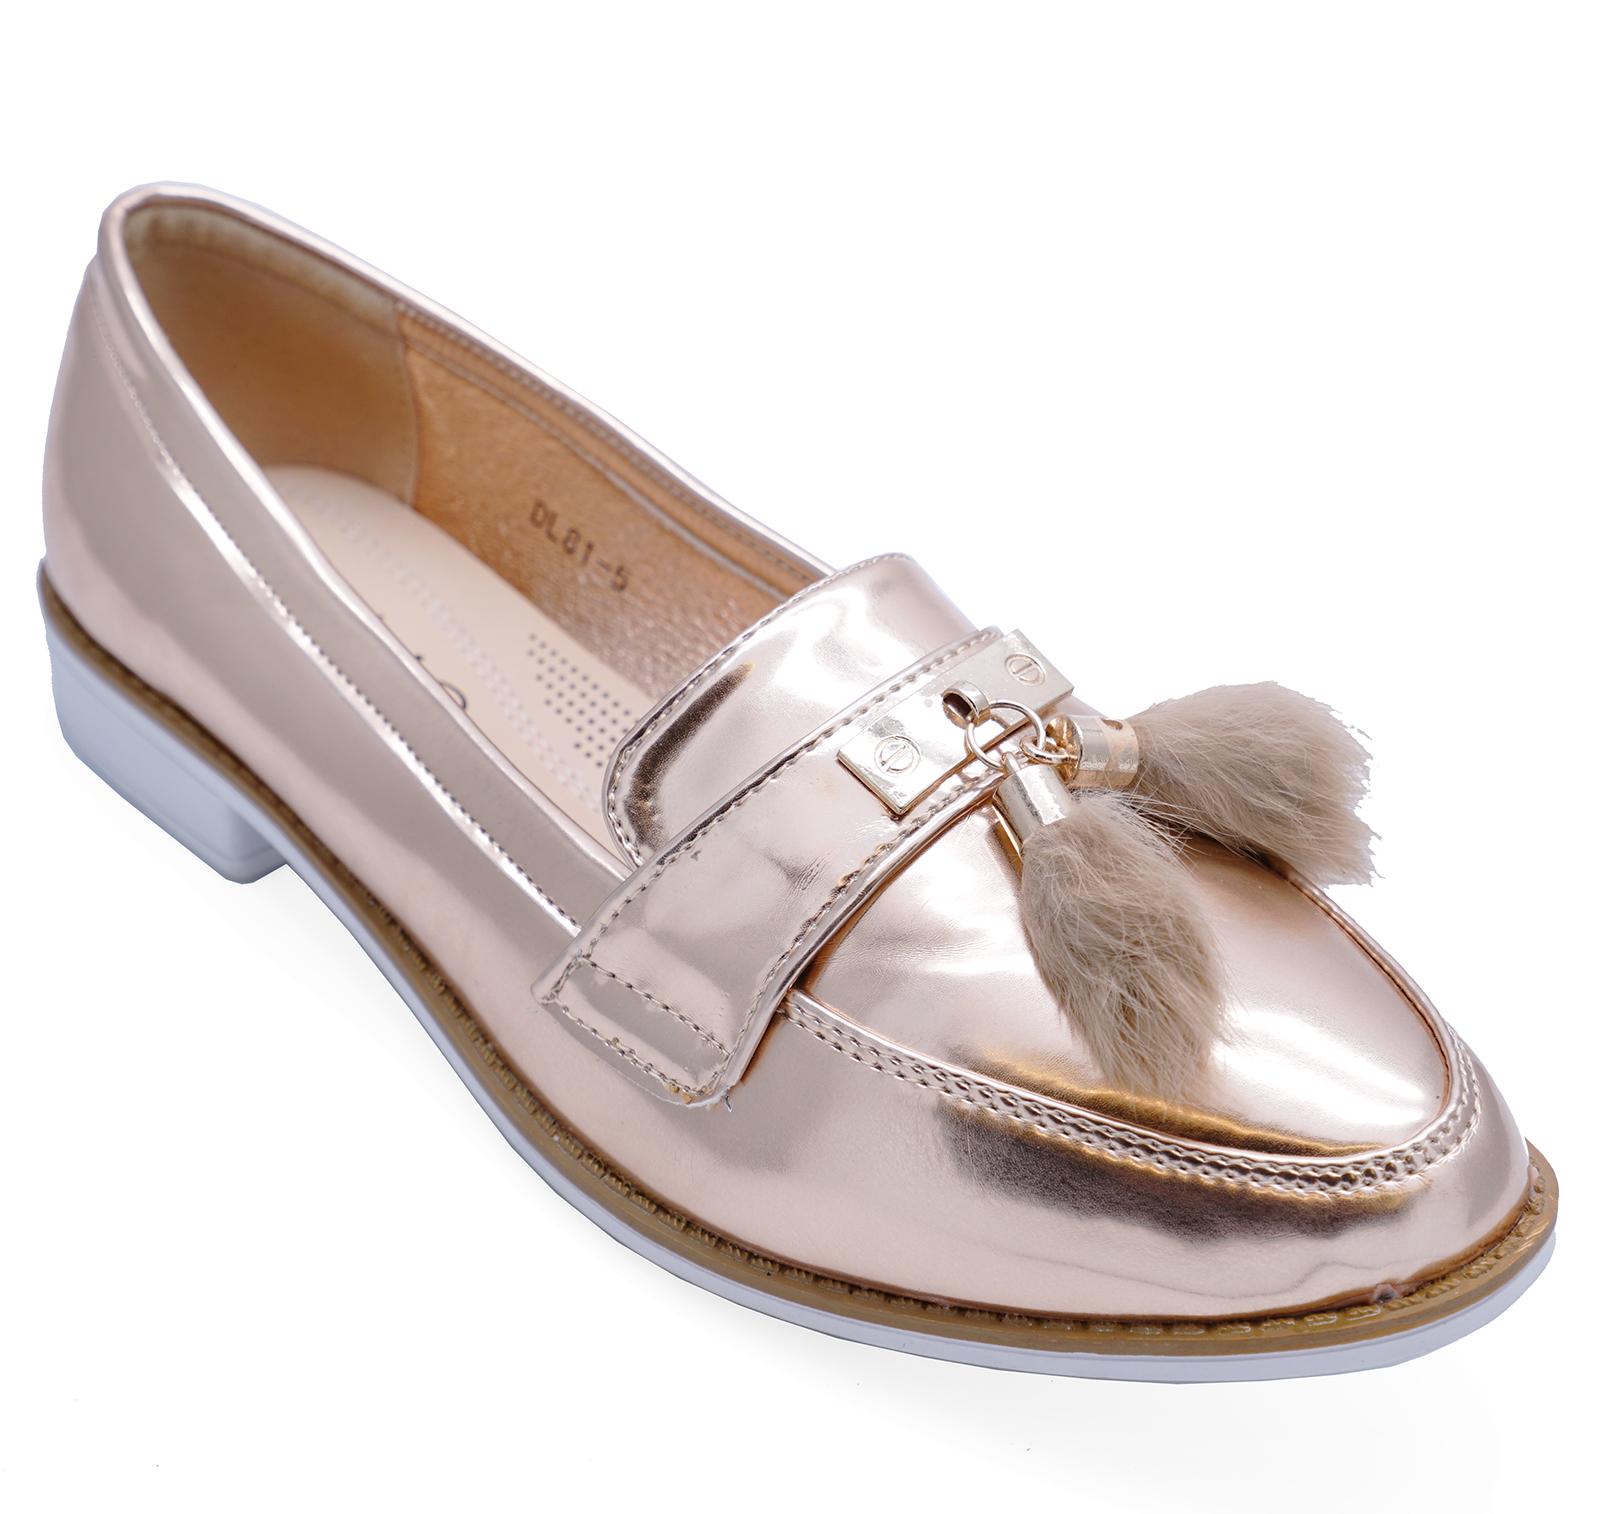 89036b48f56 Sentinel womens rose gold patent flat comfy slip on loafers smart tassle pumps  shoes jpg 1600x1514